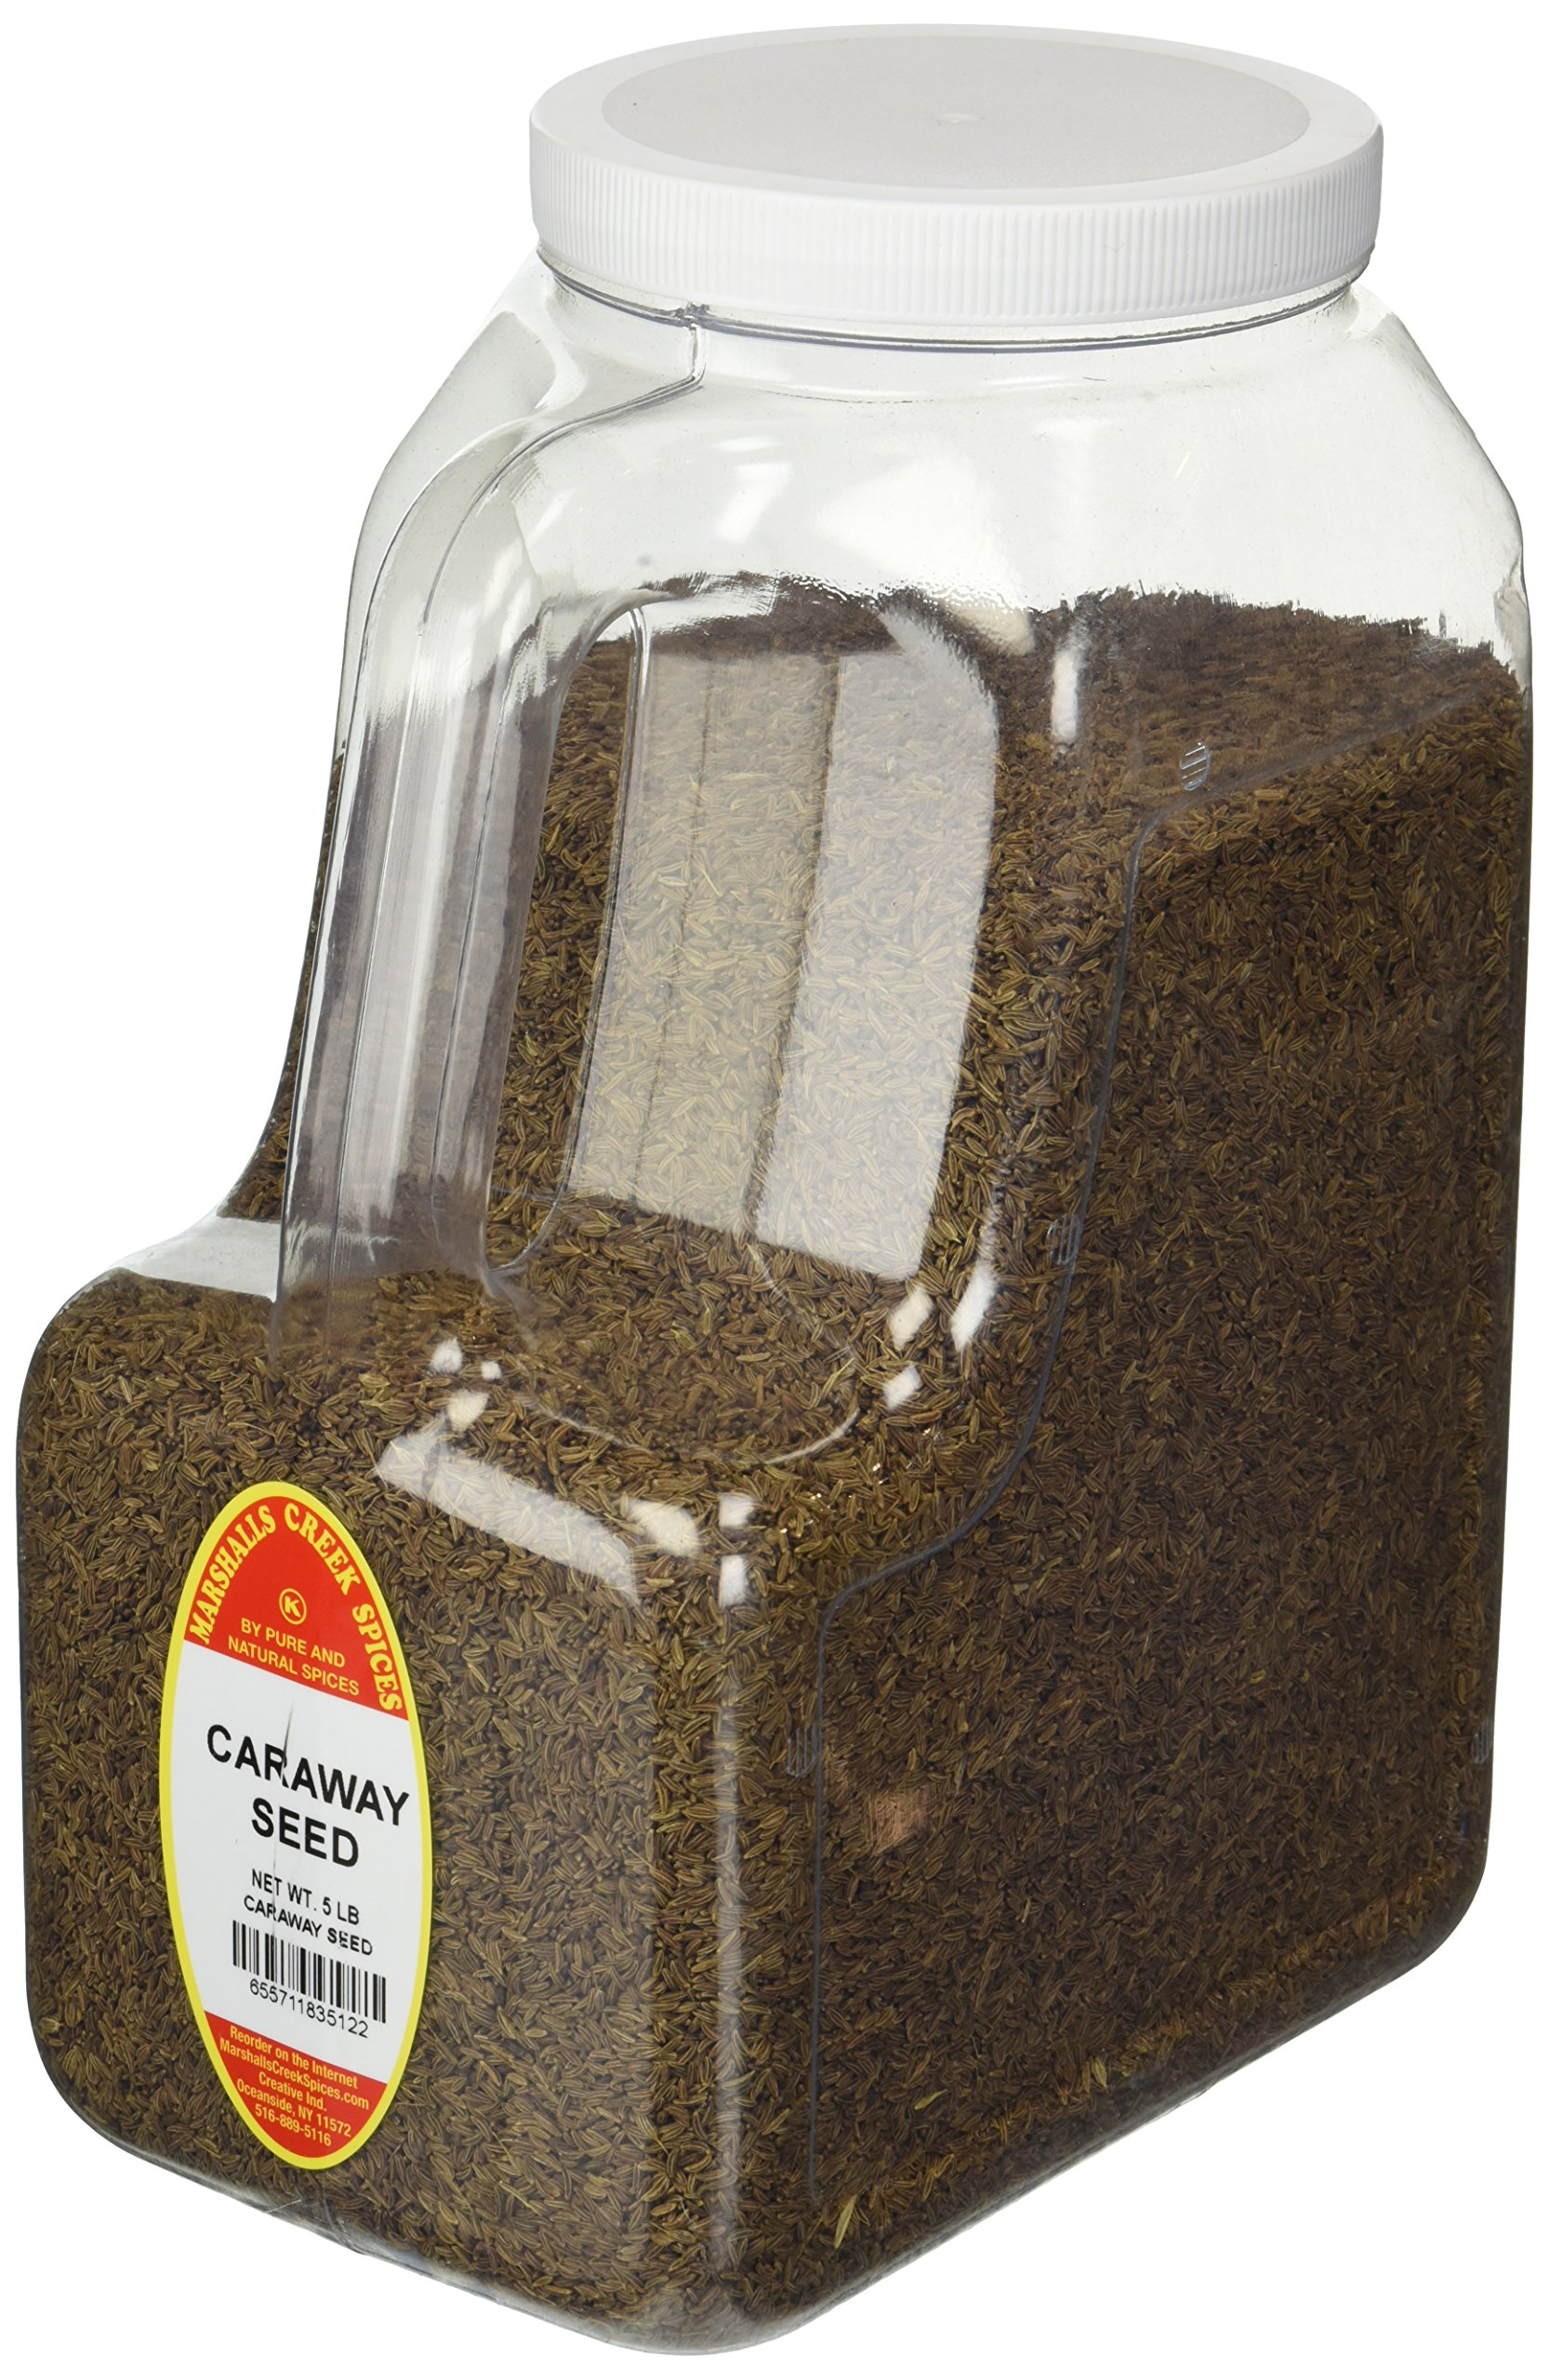 Marshalls Creek Spices CARAWAY SEED 5 LB. RESTAURANT SIZE JUG, 5 Pound